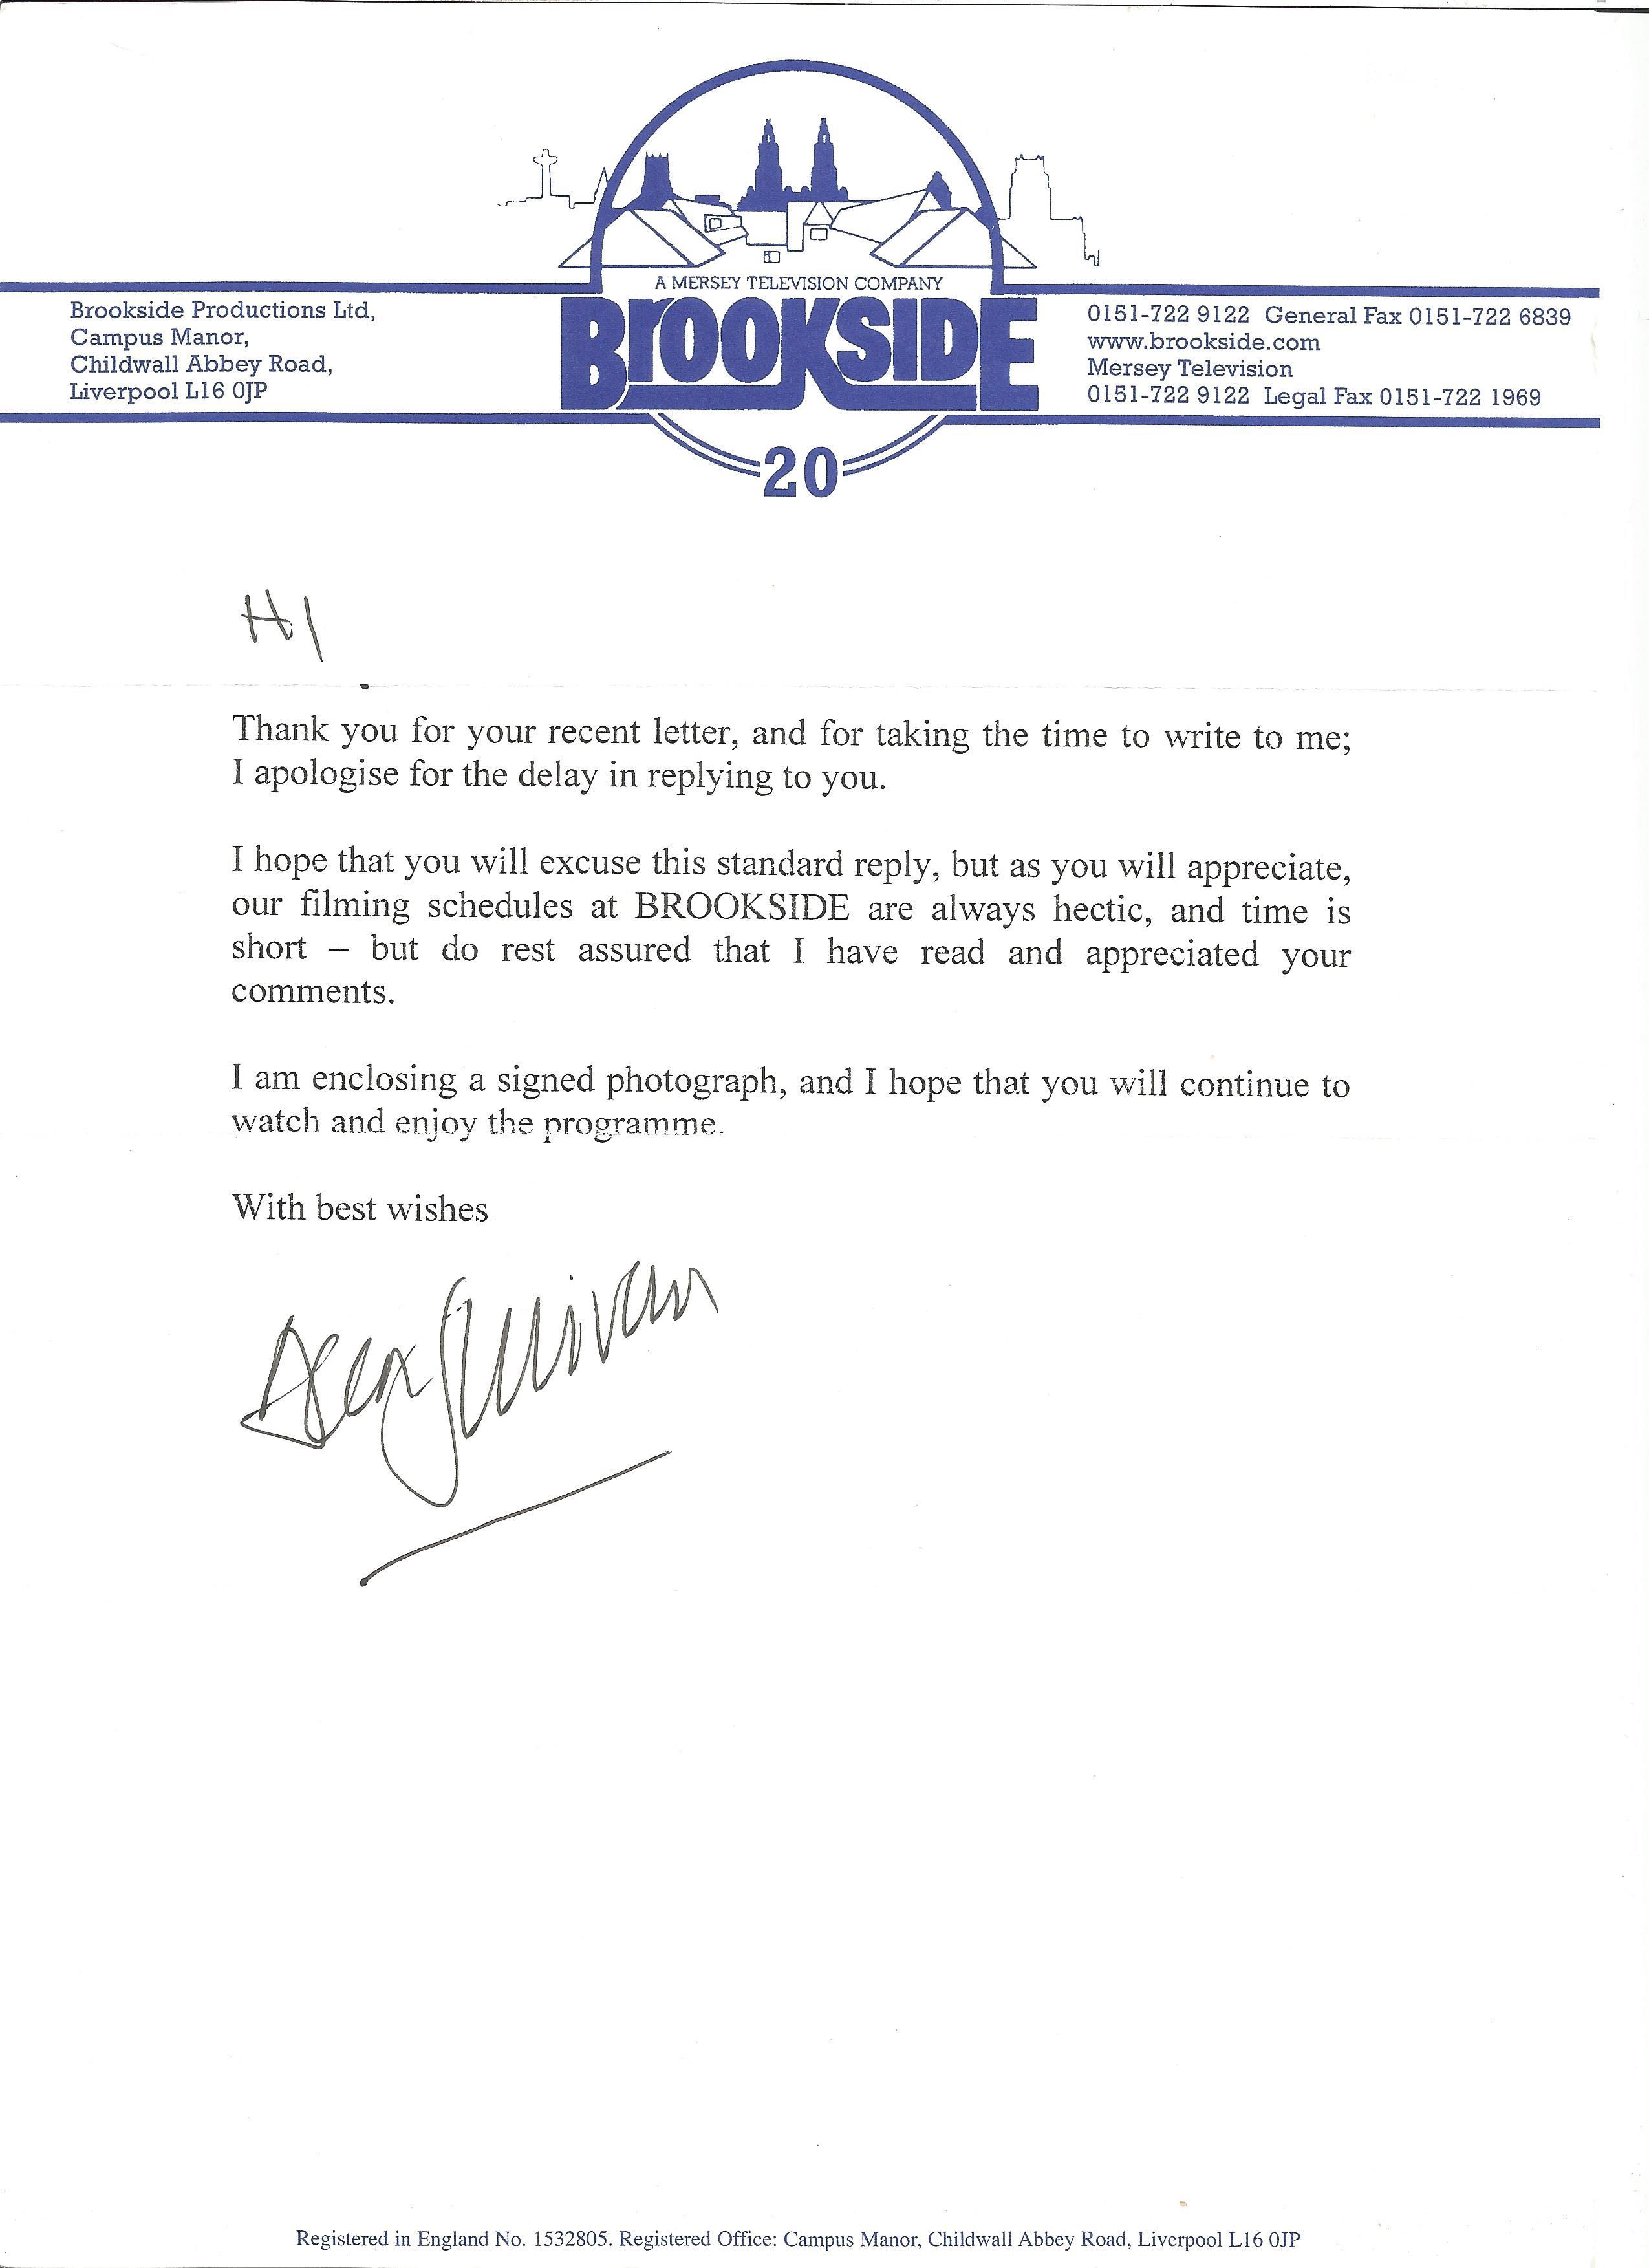 Soap Actors signed letters Andrew Larkin, Bill Tarmey, Dean Sullivan, Tracie Bennett, Isabel Home - Image 4 of 4